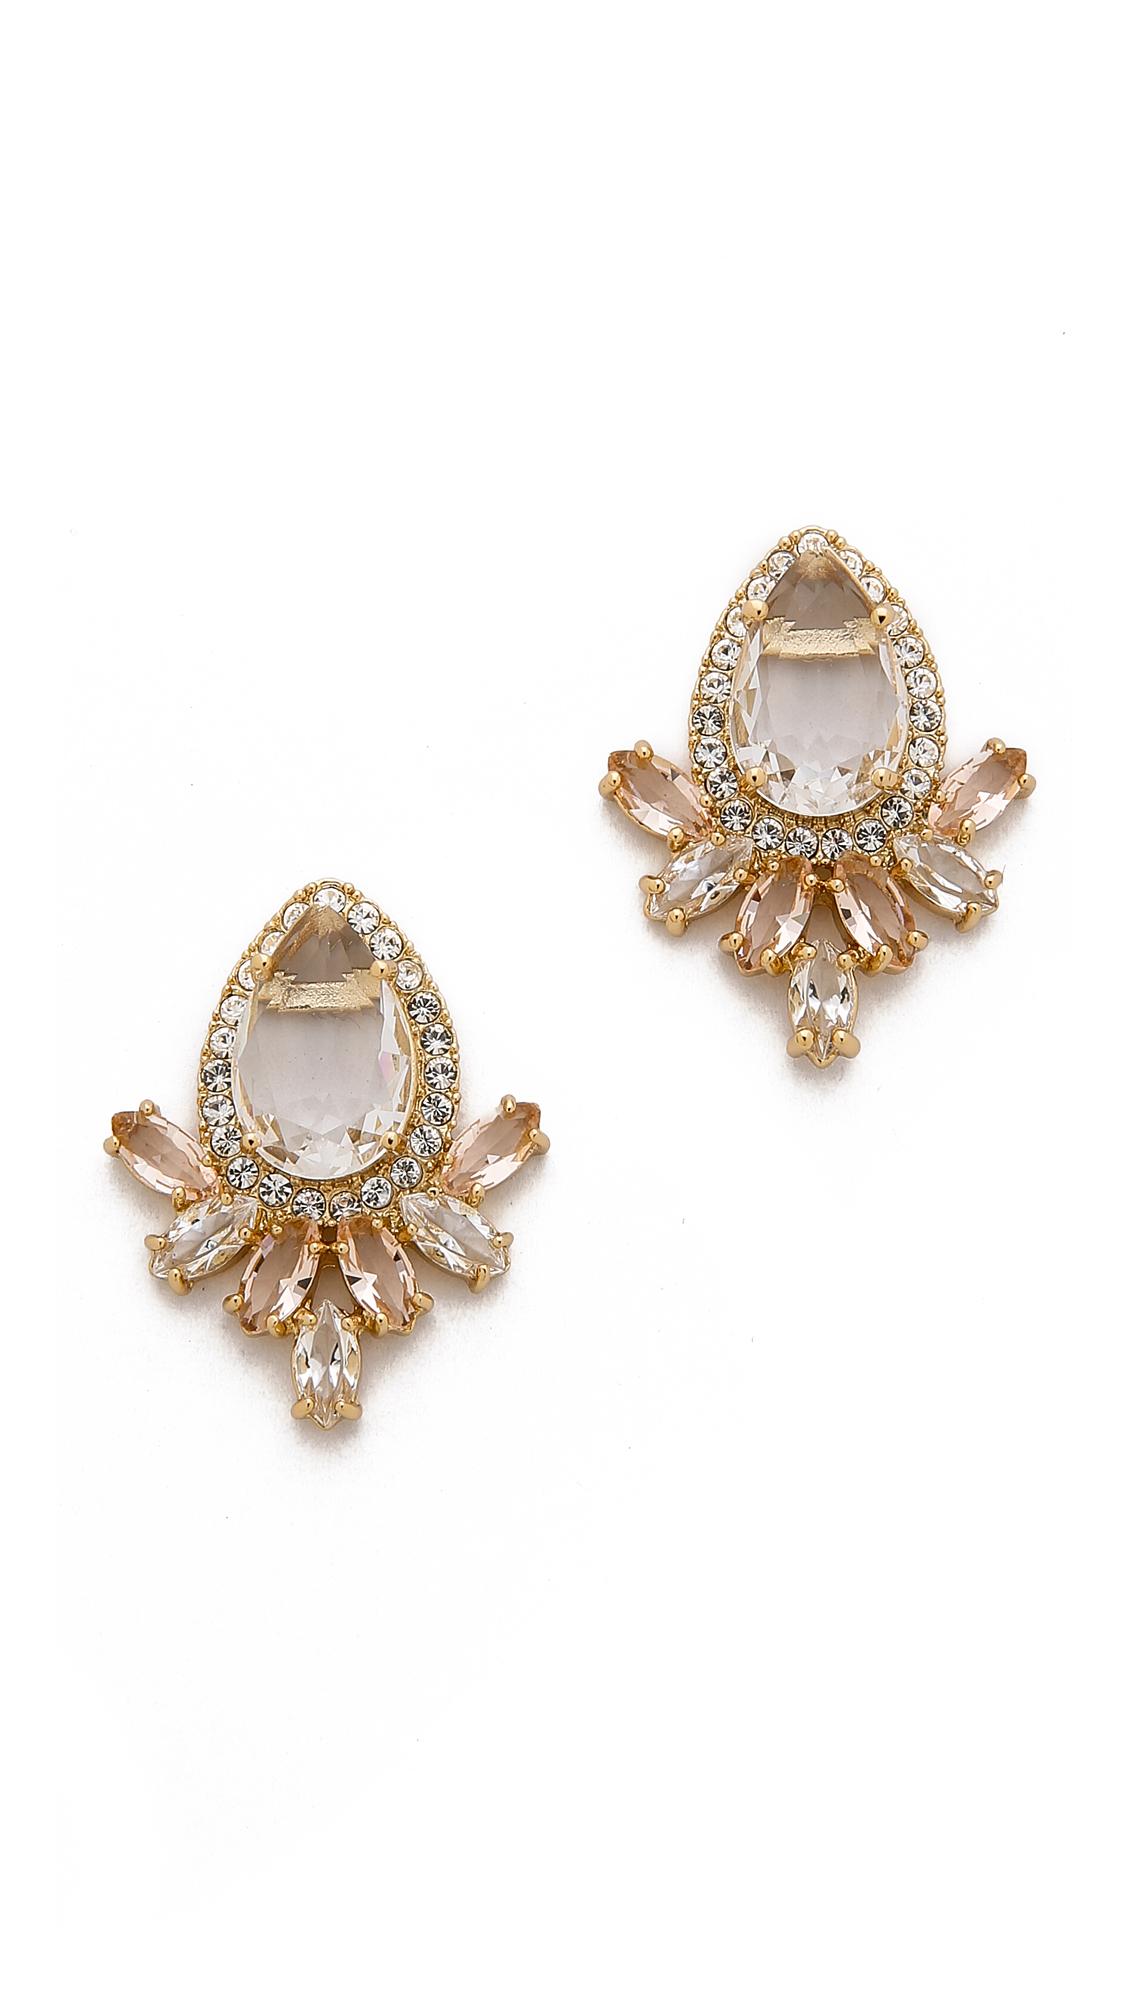 Lyst Kate Spade New York Razzle Dazzle Cluster Earrings